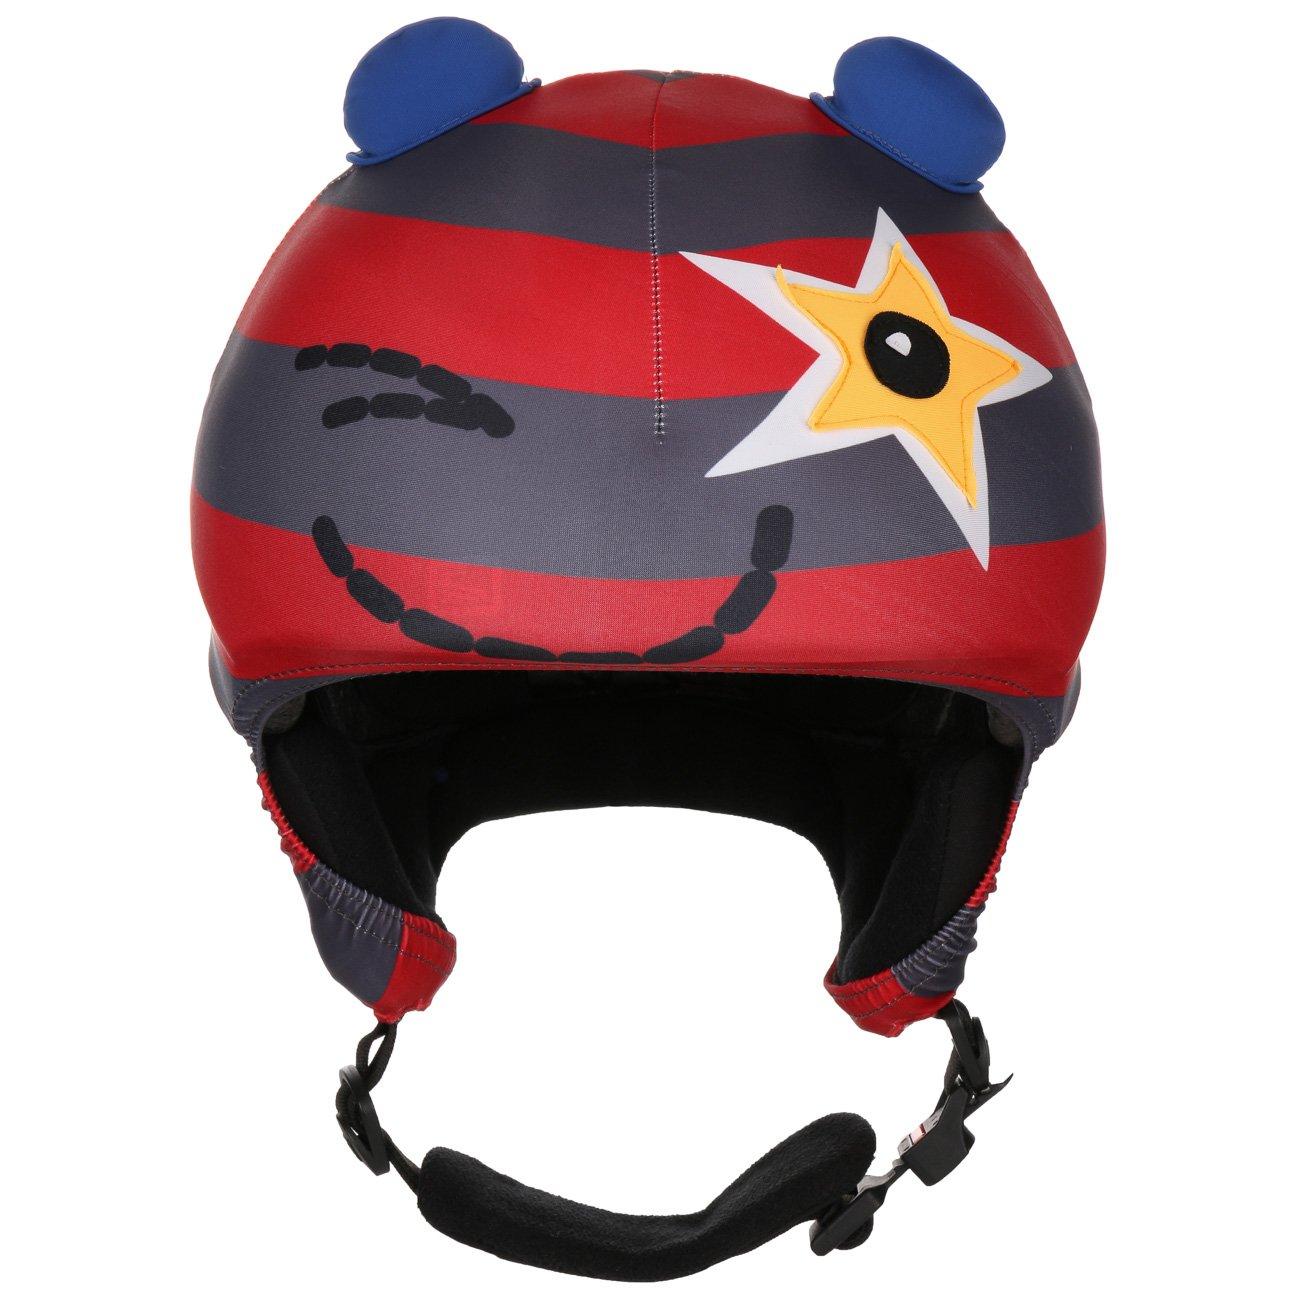 Barts Boys Helmet Cover Balaclavas